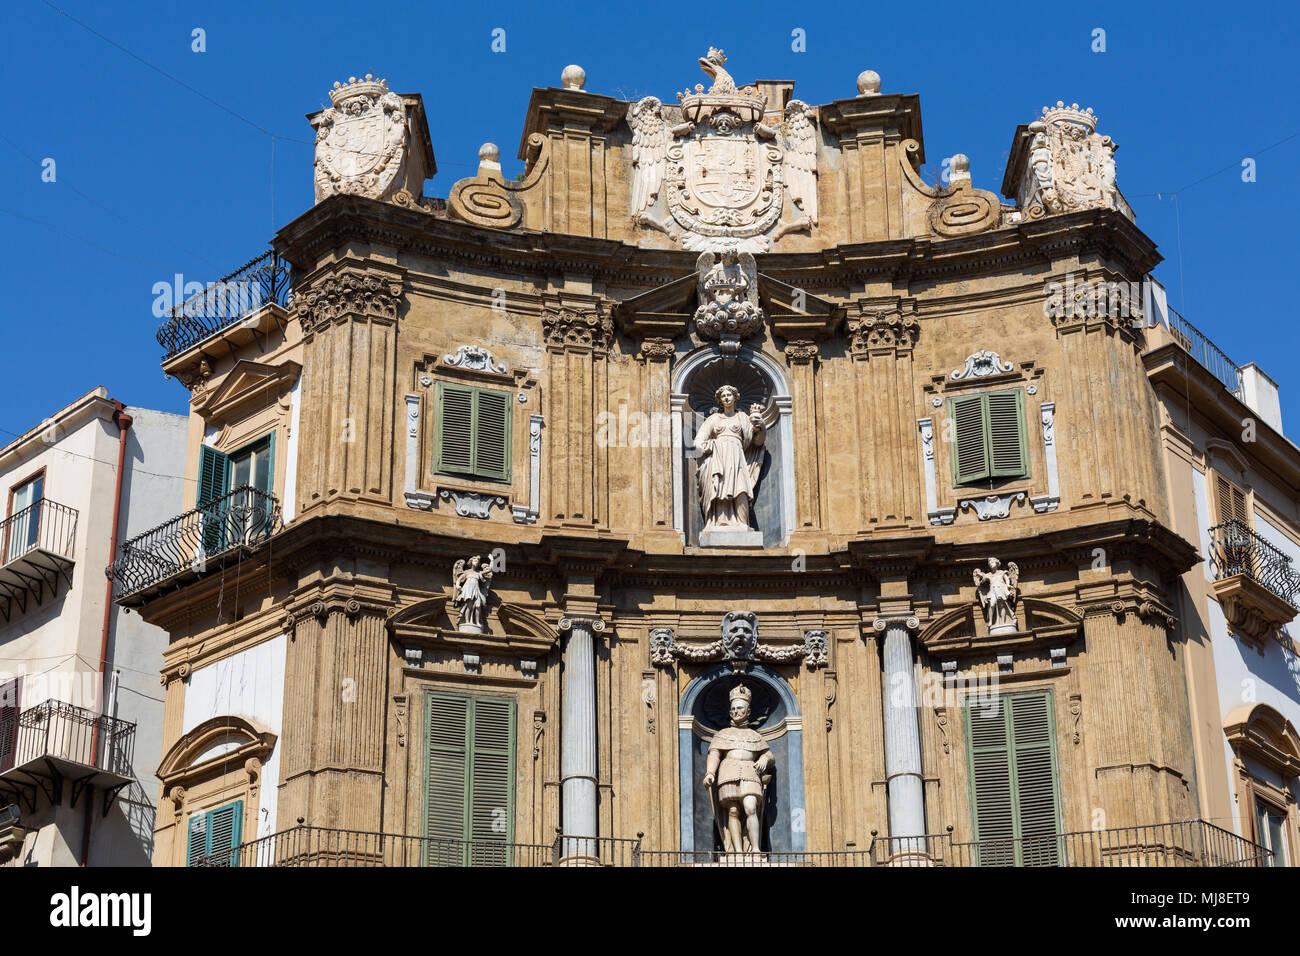 Quattro Canti, Palermo, Italy - Stock Image